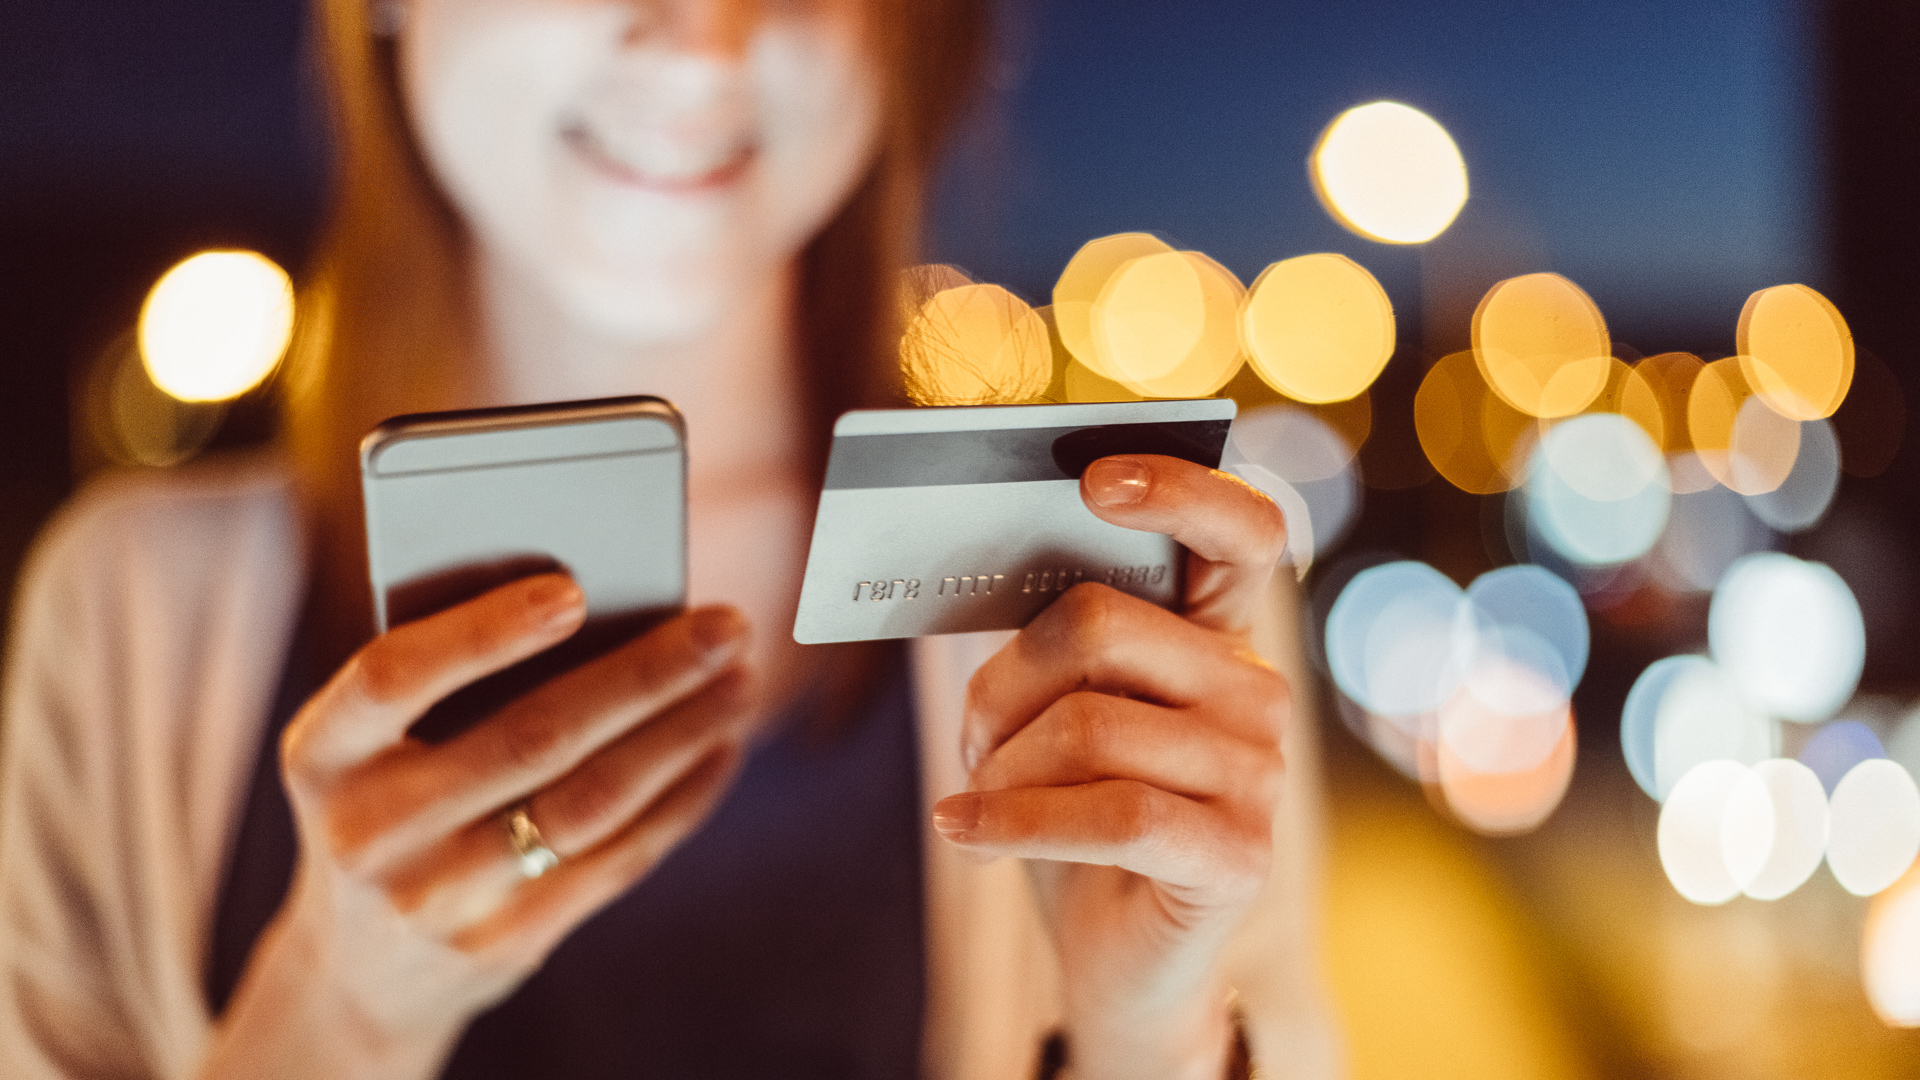 Card credit free membership no no porn video